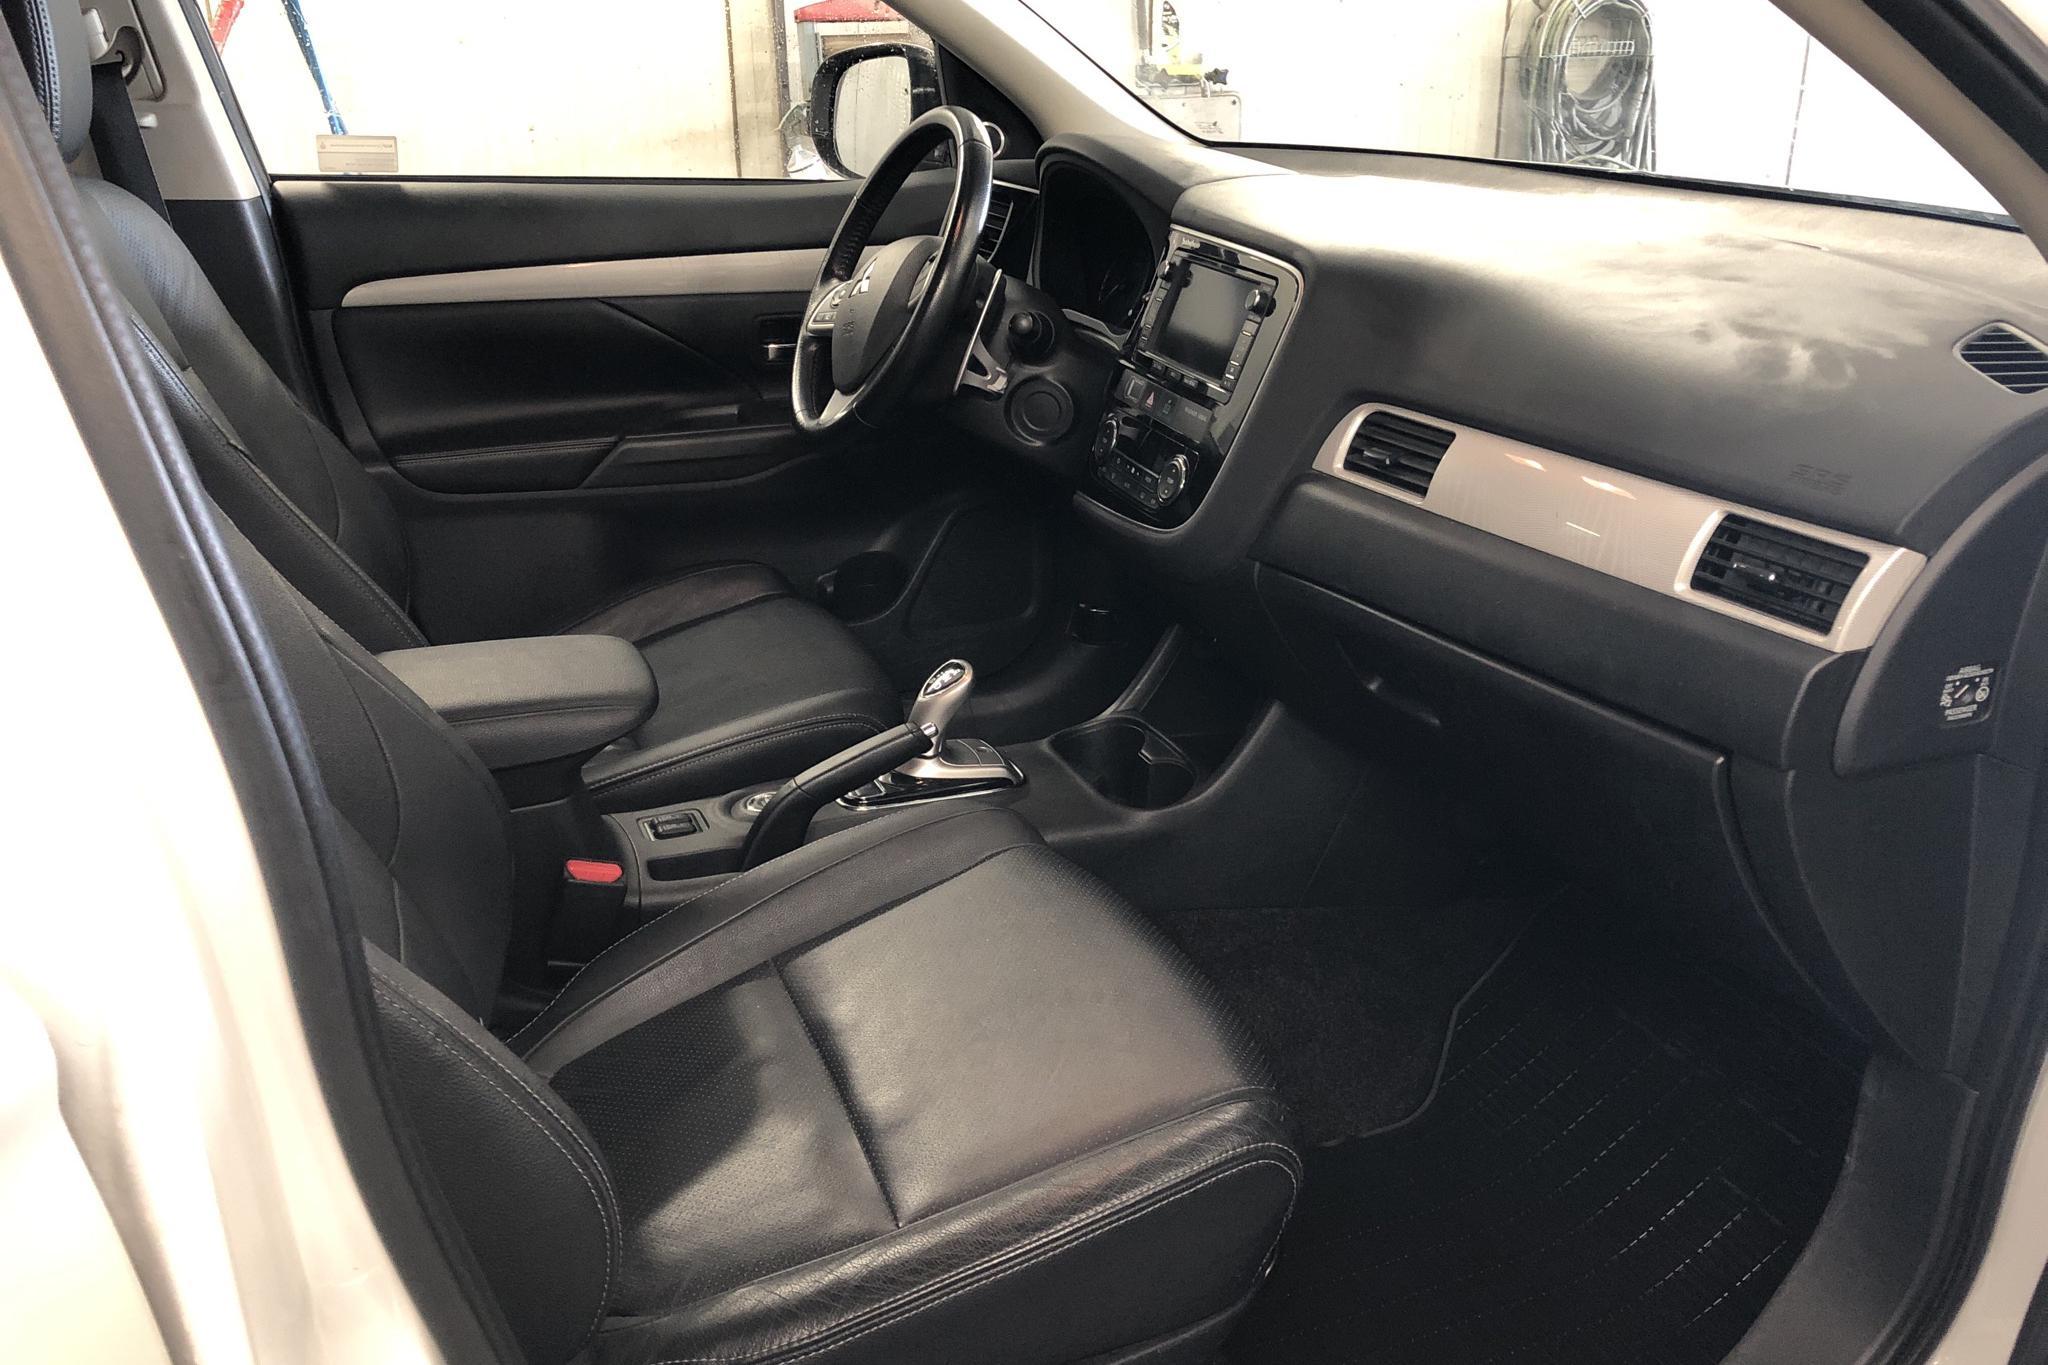 Mitsubishi Outlander 2.0 Plug-in Hybrid 4WD (121hk) - 145 780 km - Automatic - white - 2014